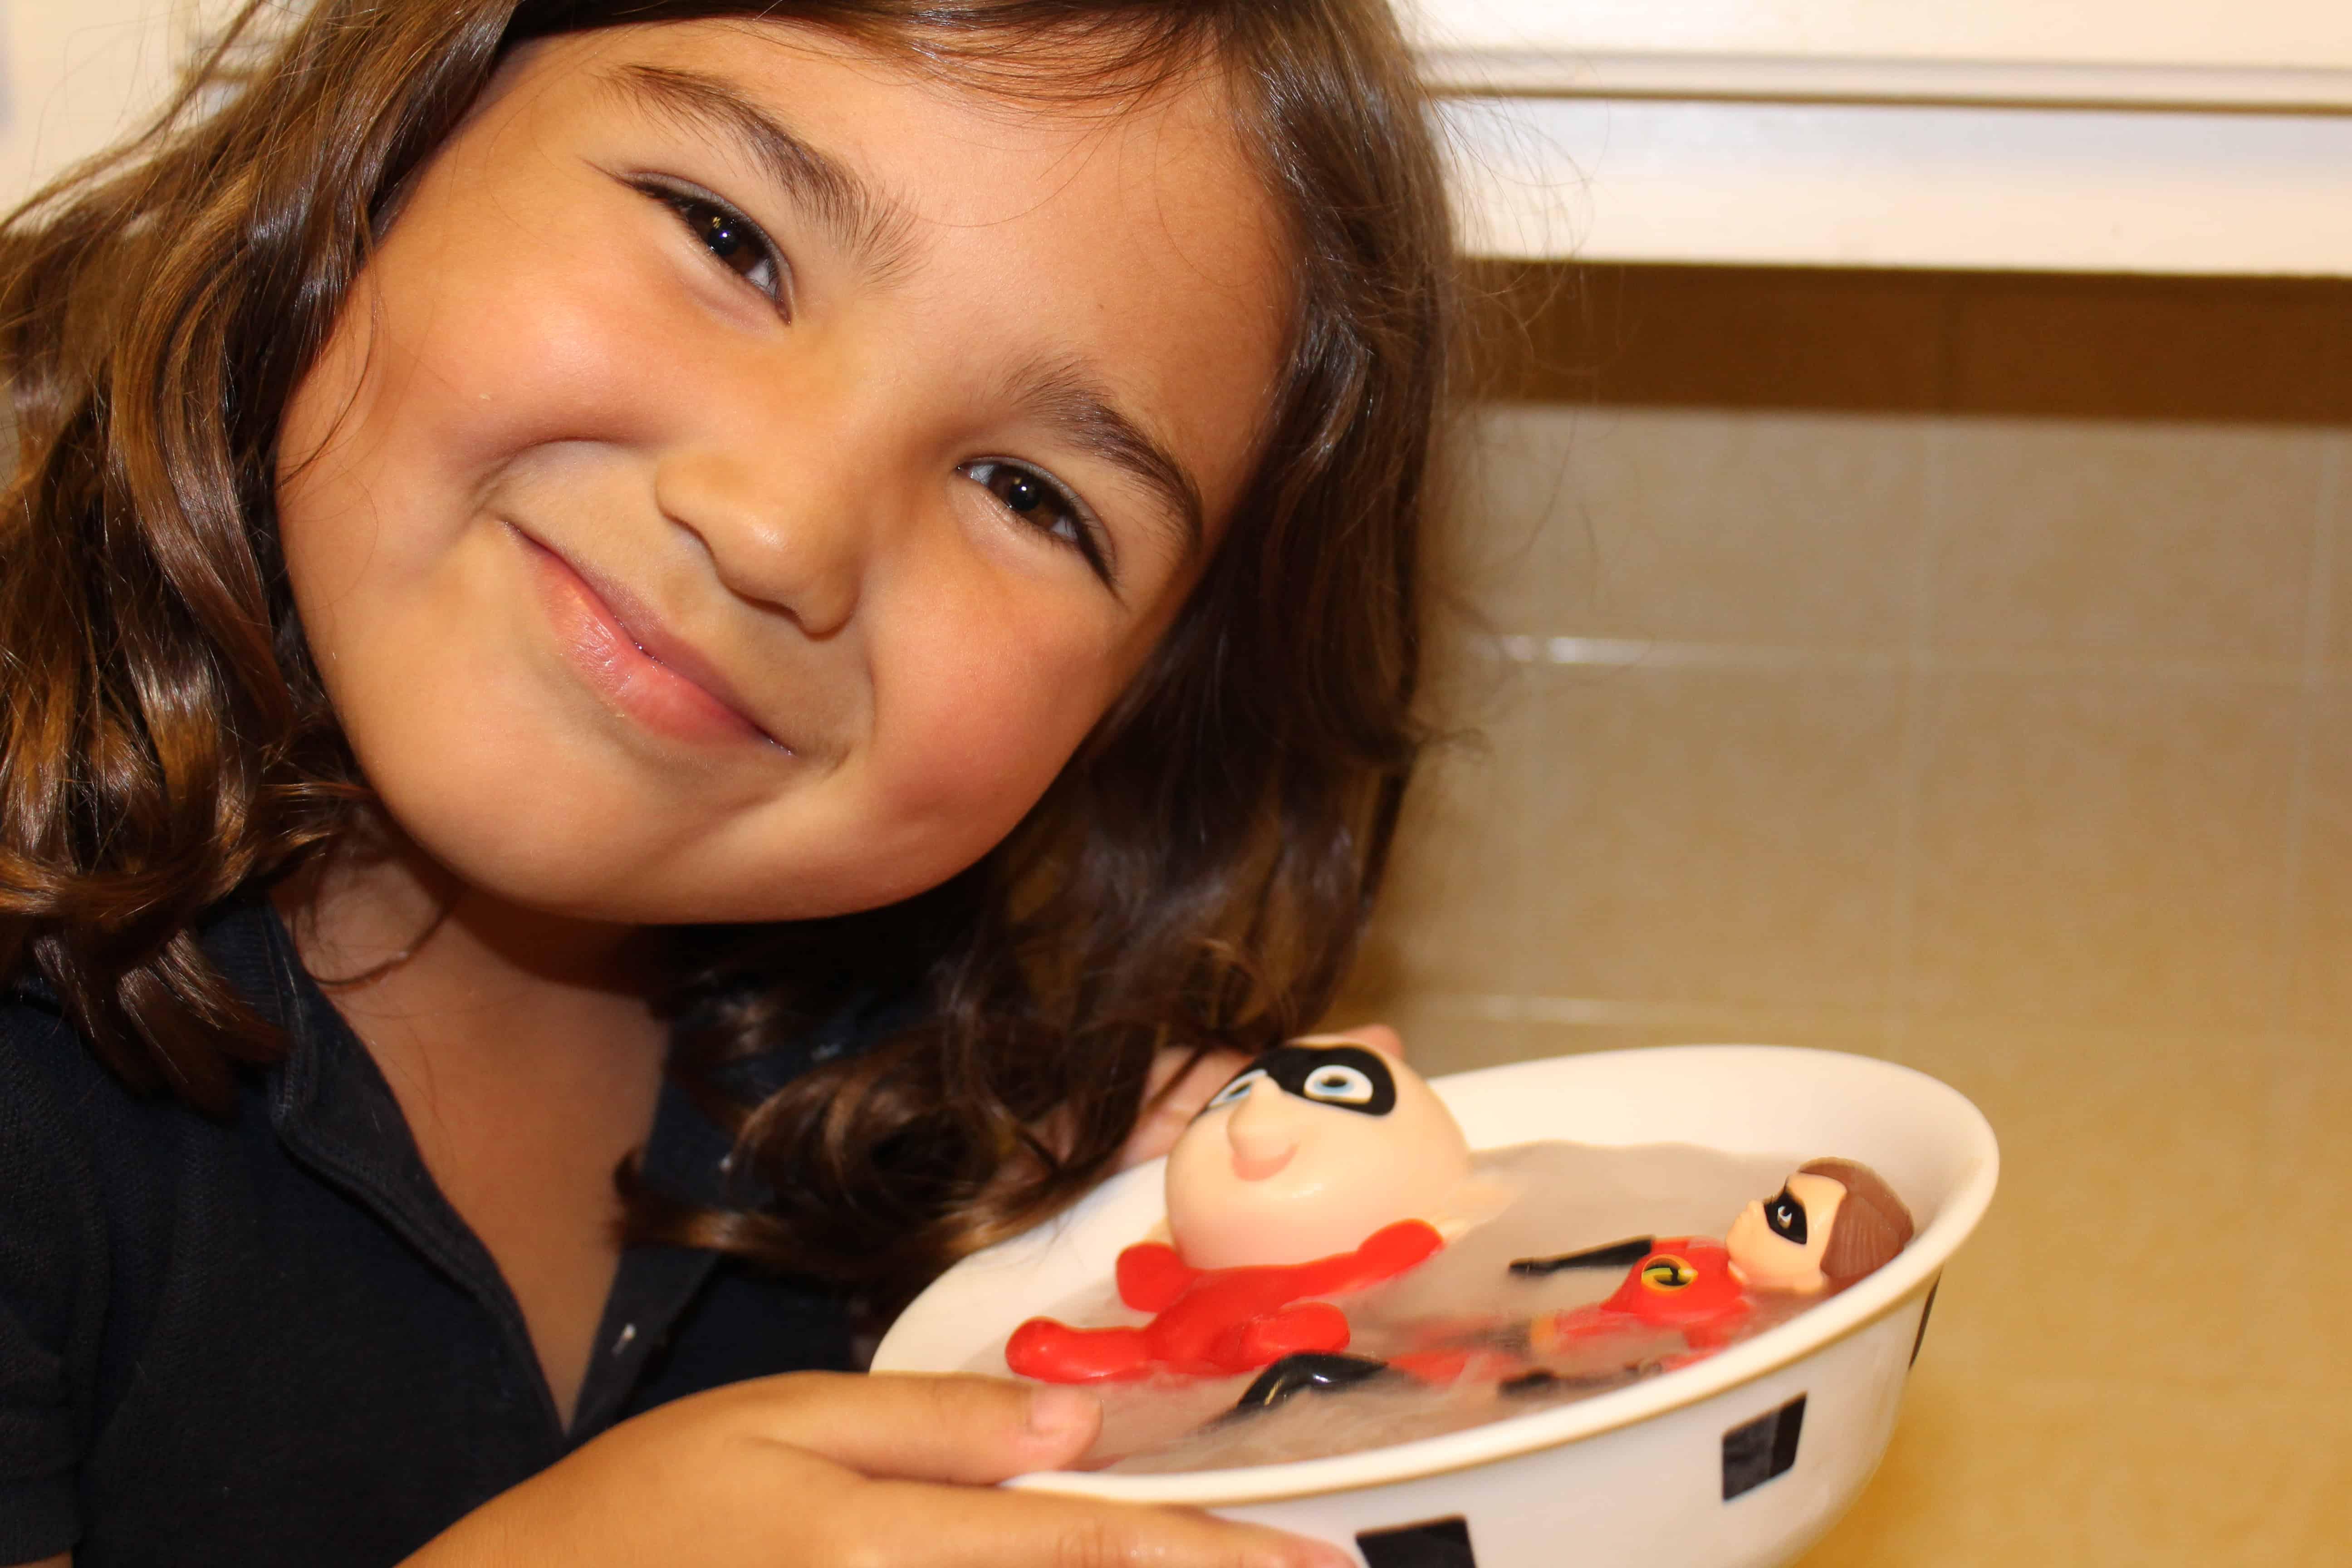 Smiling girl holding bowl of frozen ice.